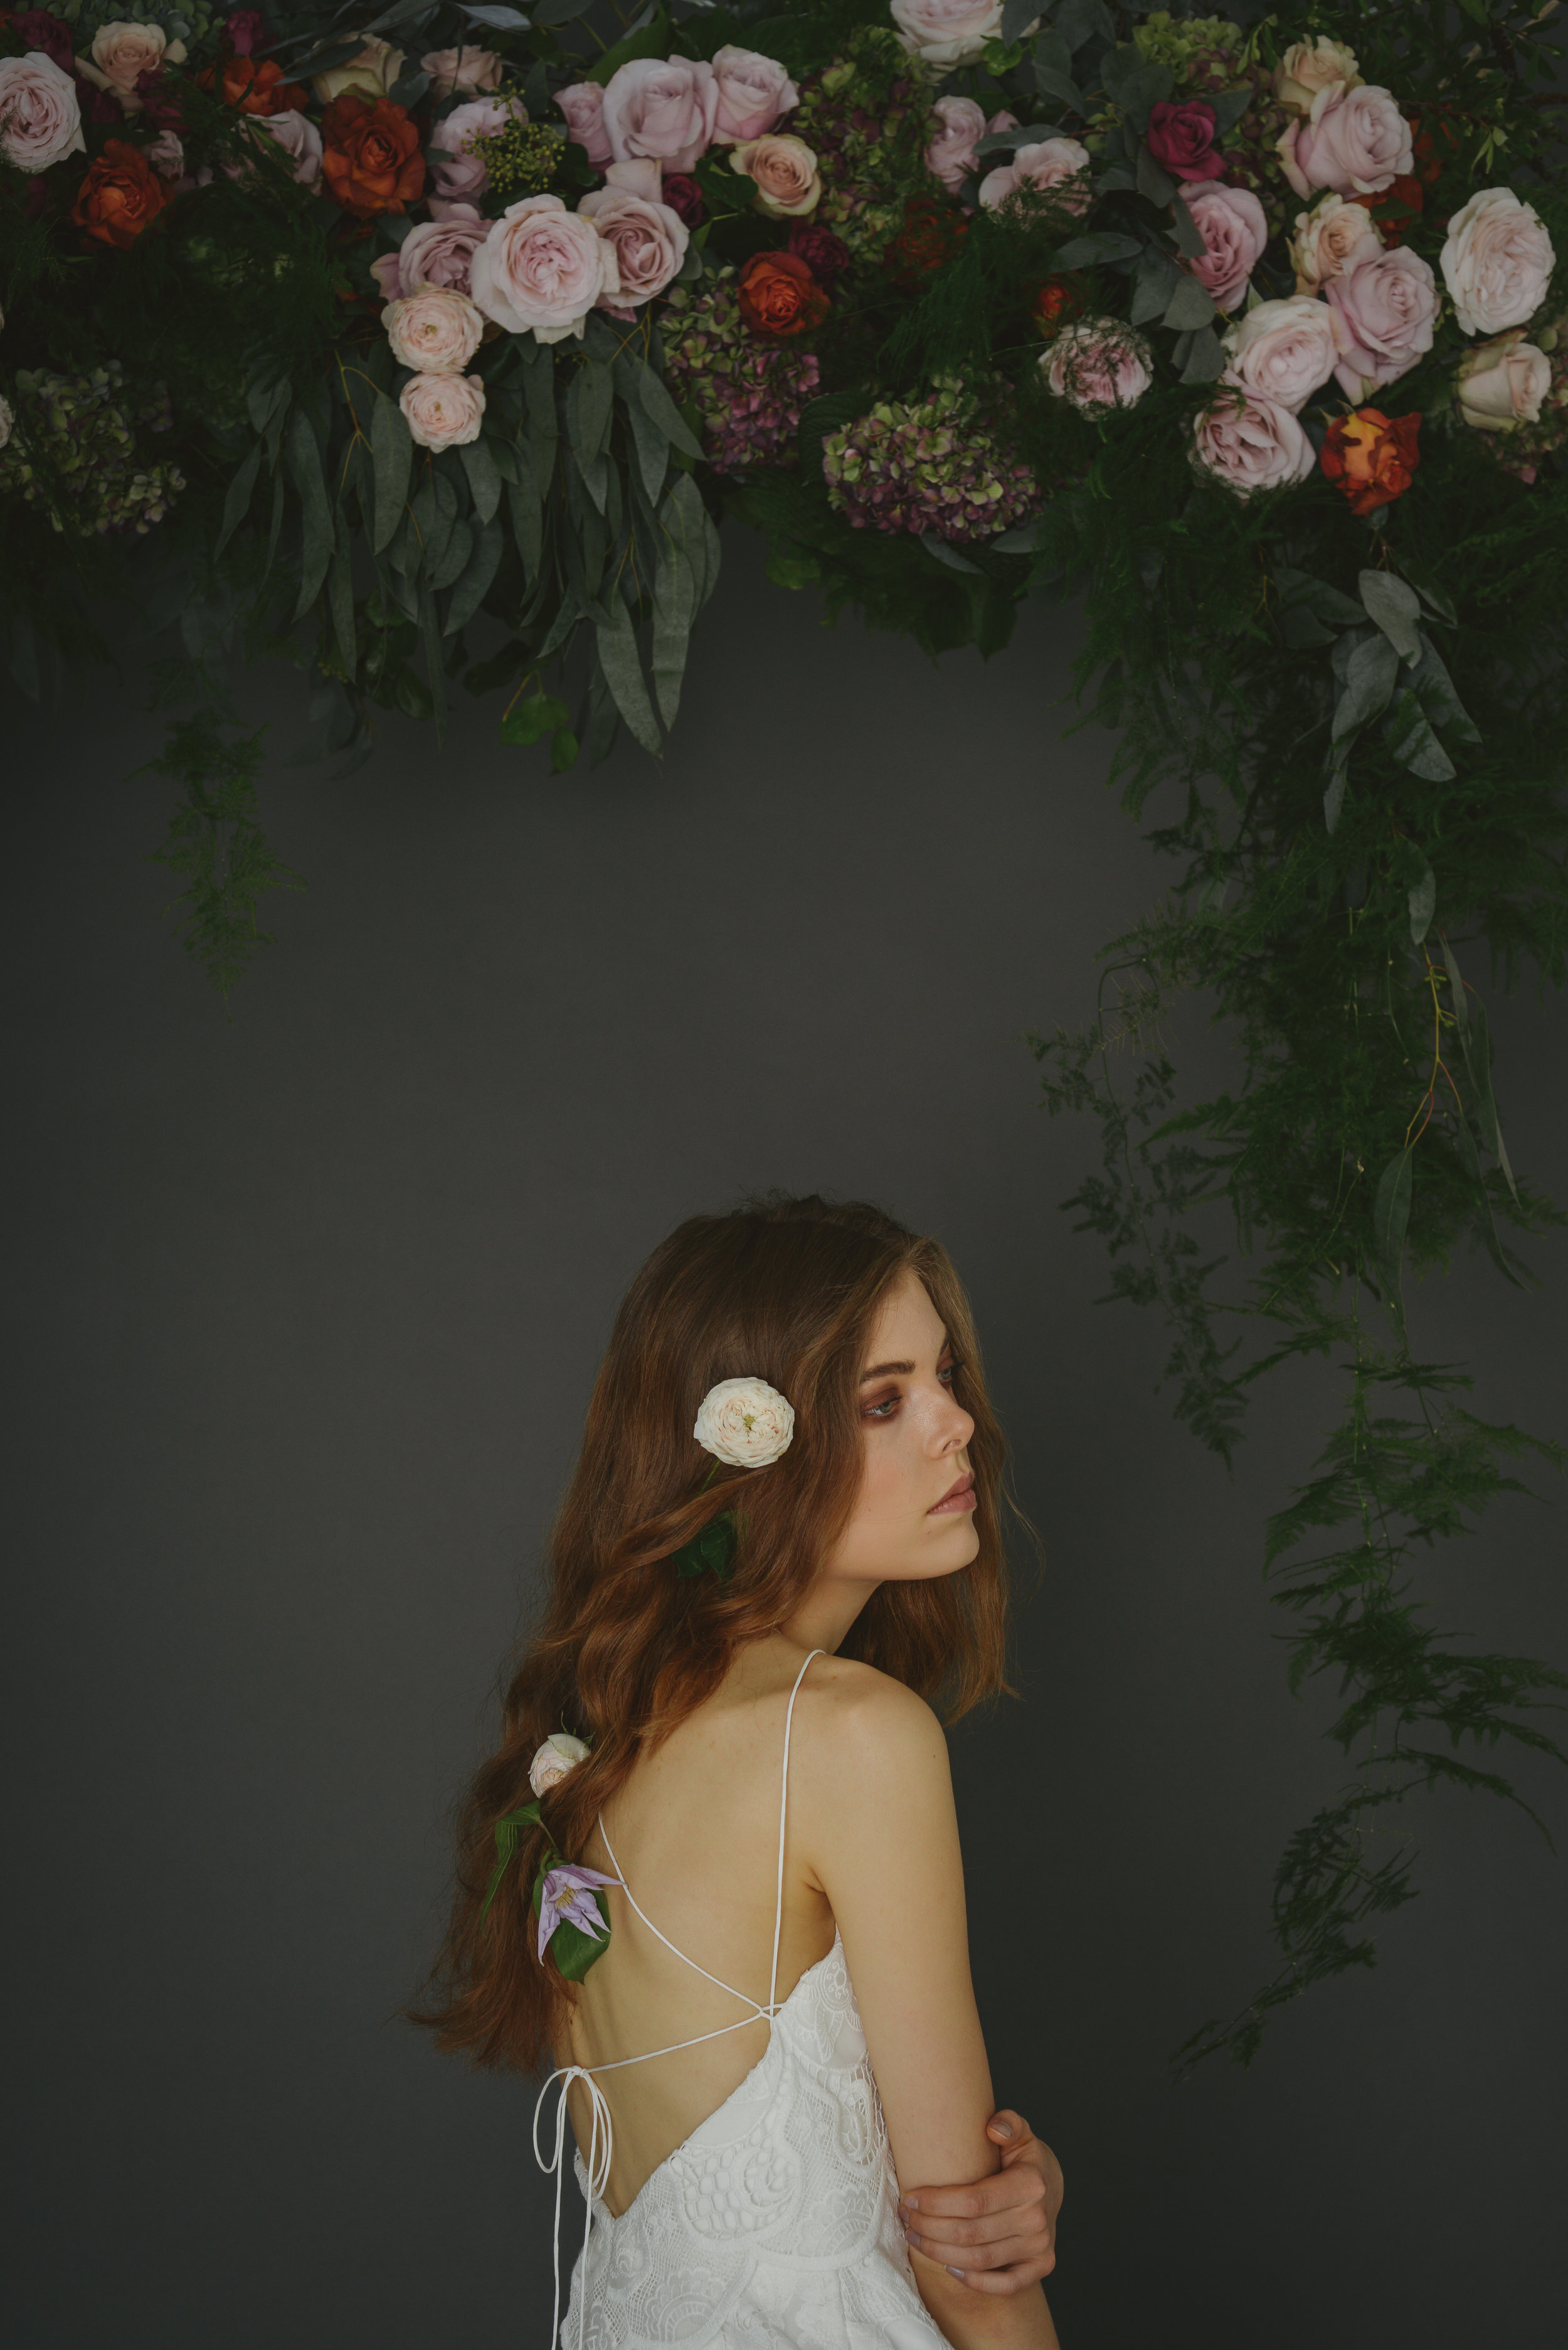 RomanticStudio_SarahBurton_1#1.jpg